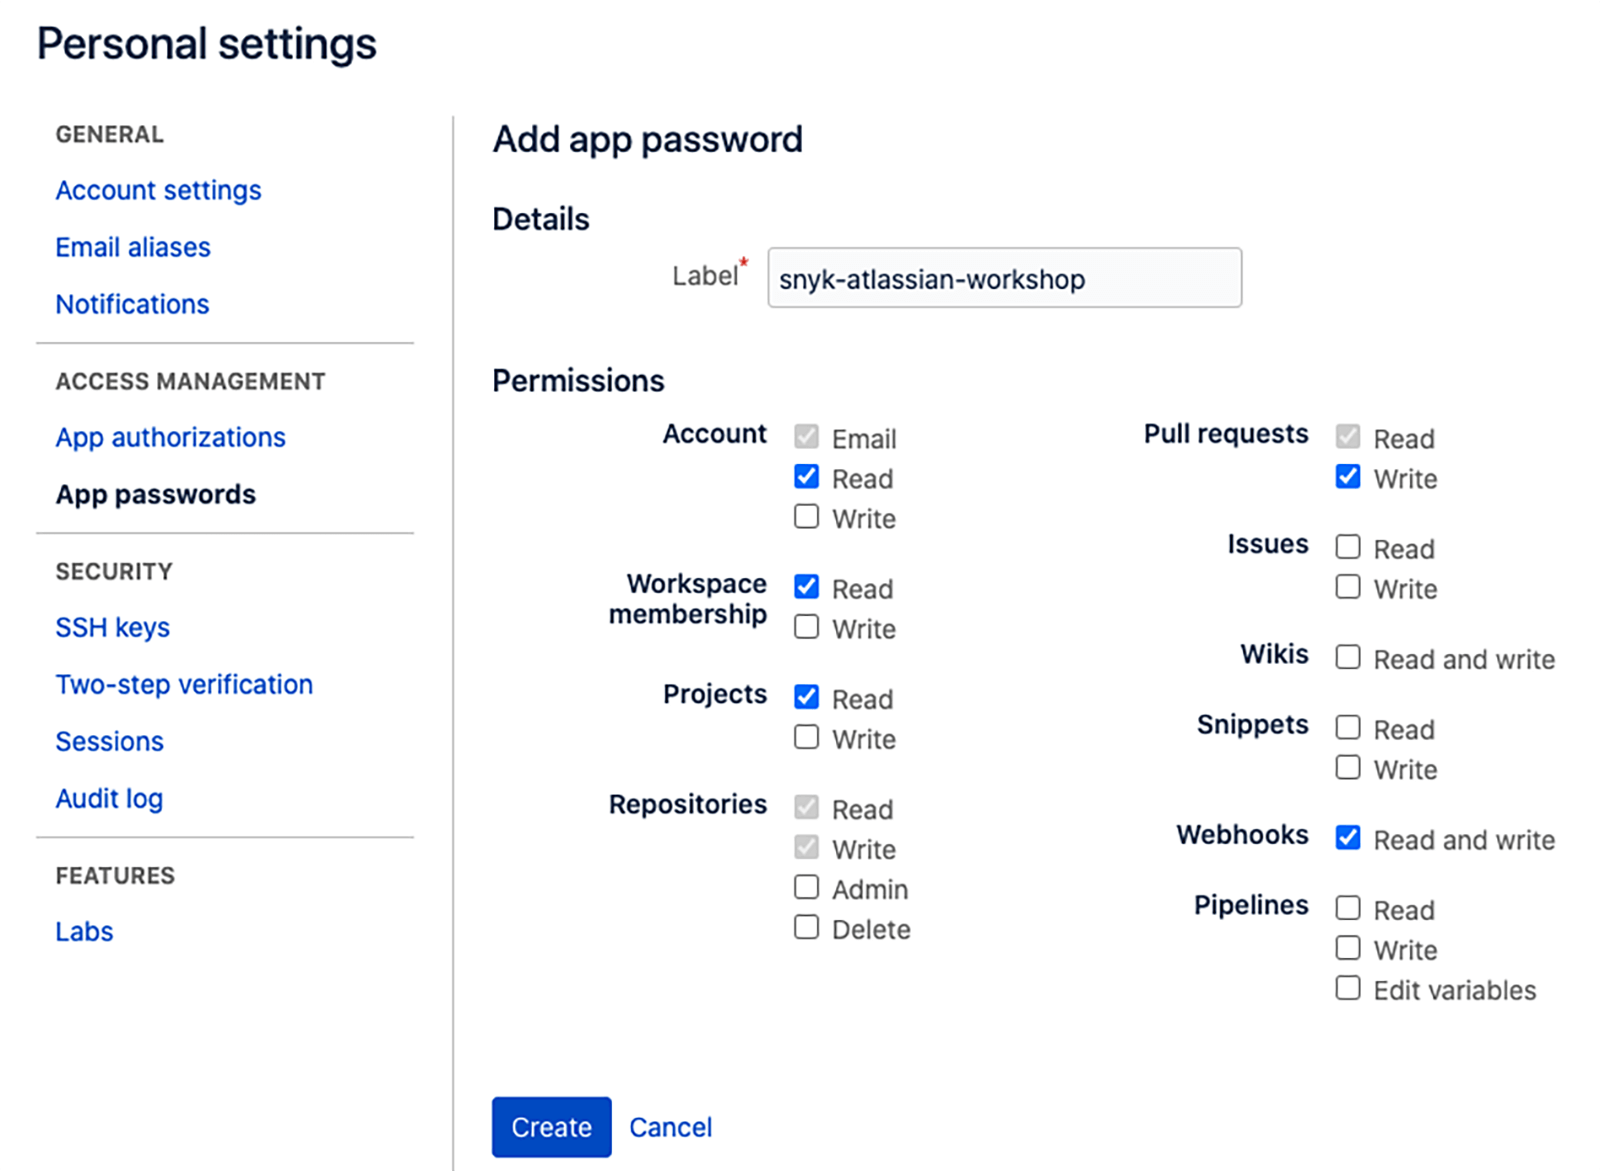 Personal settings window